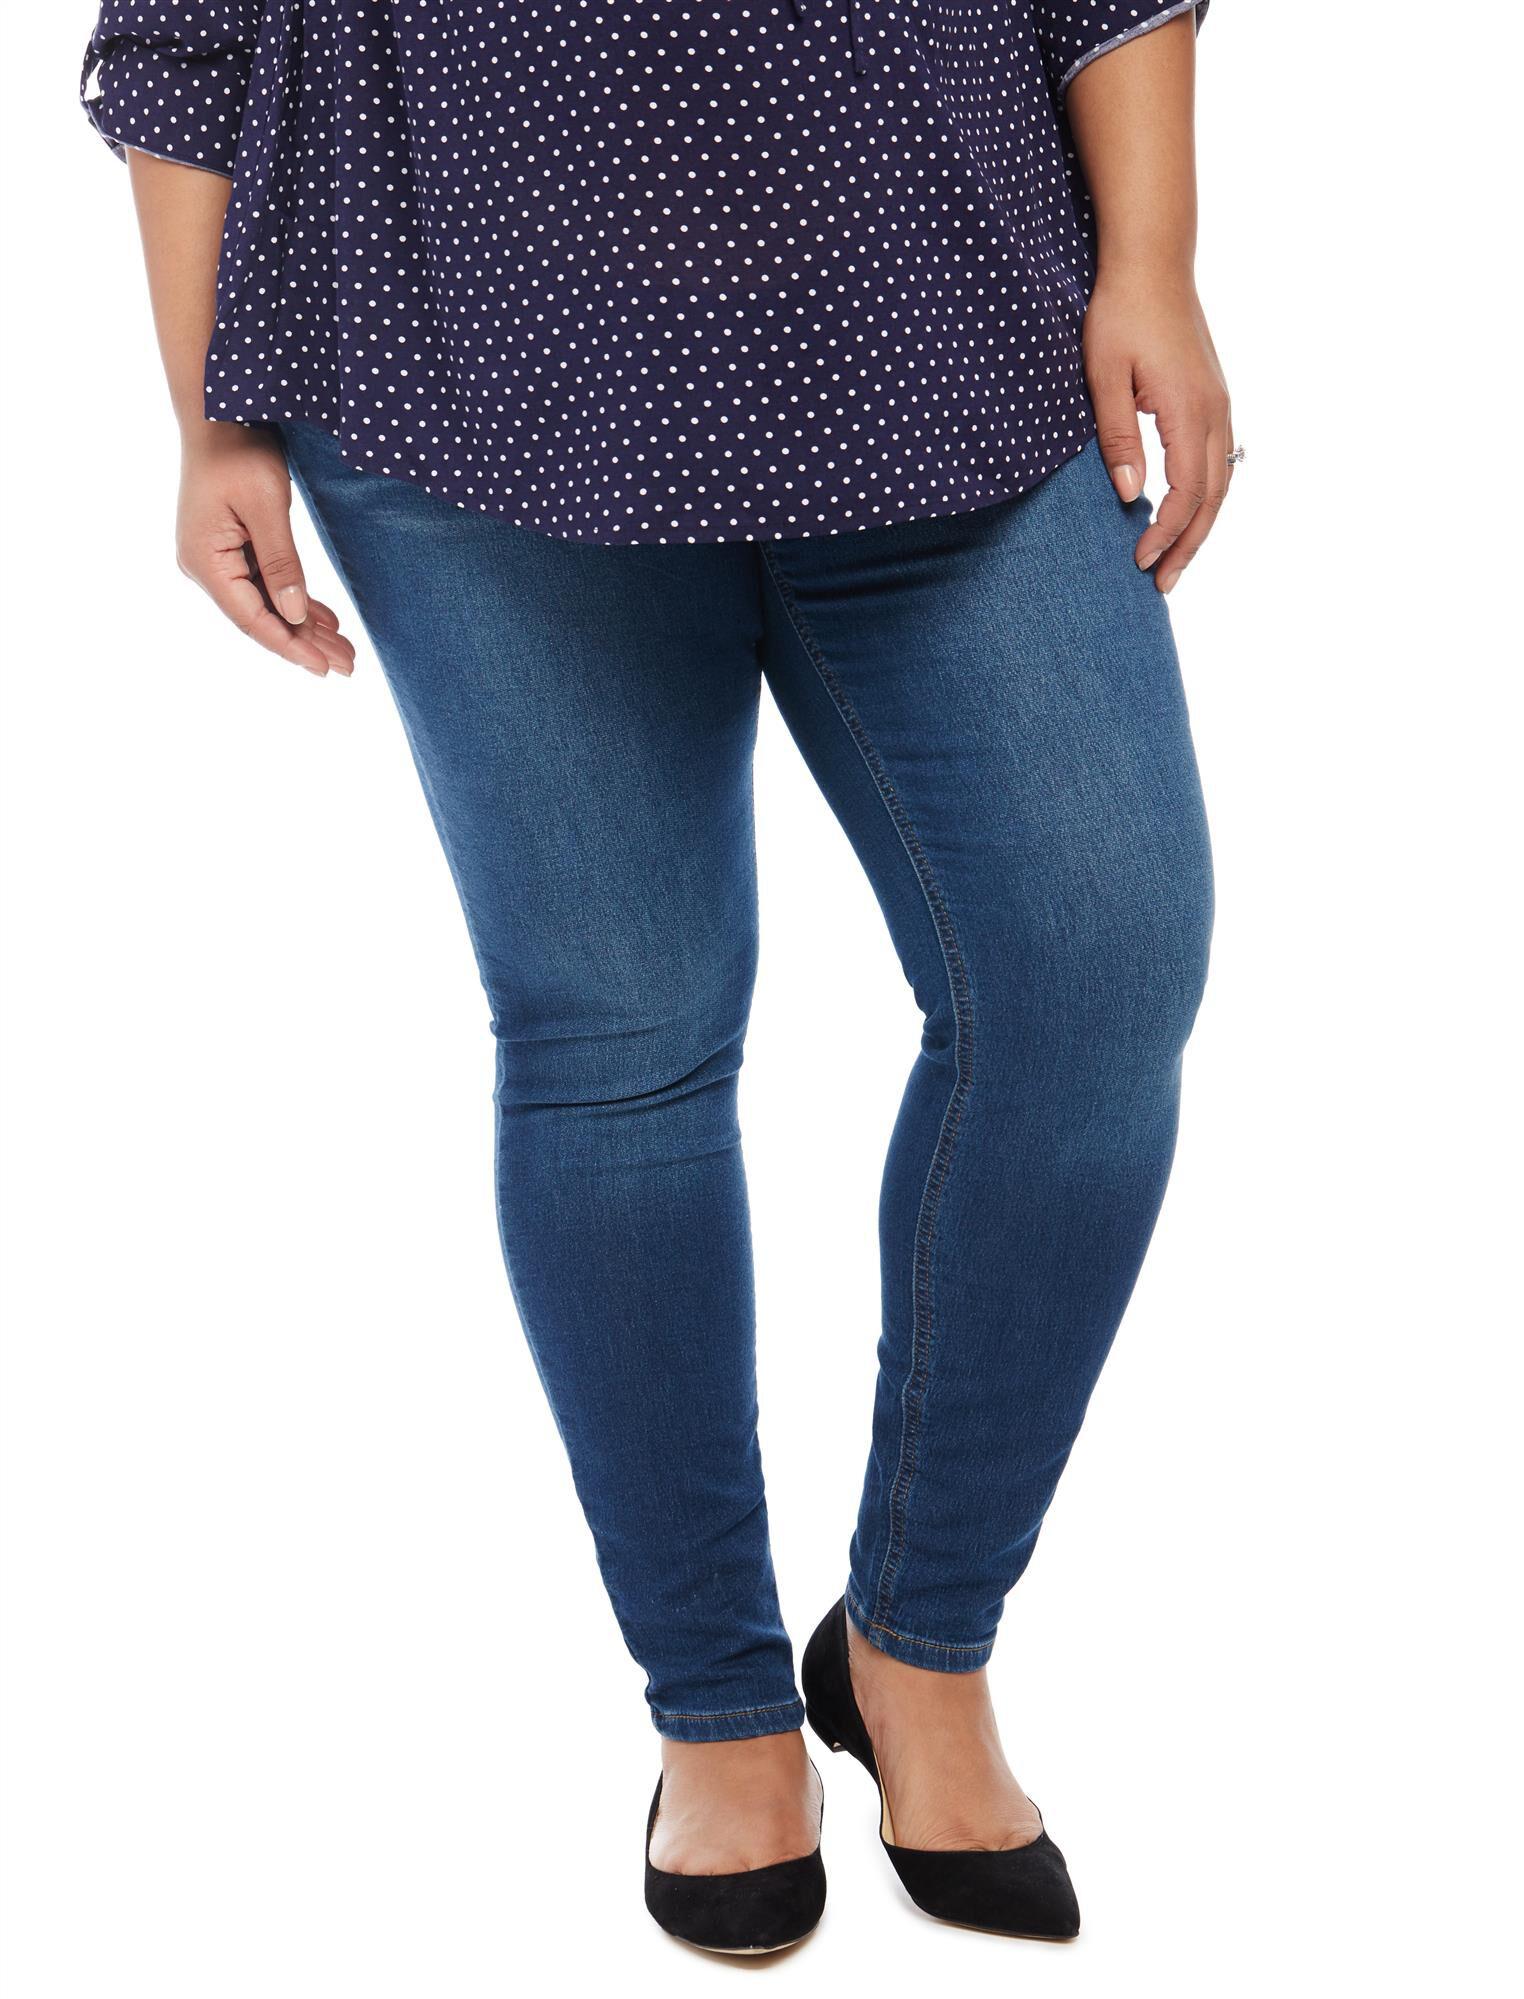 Plus Size Secret Fit Belly Jegging Maternity Jeans